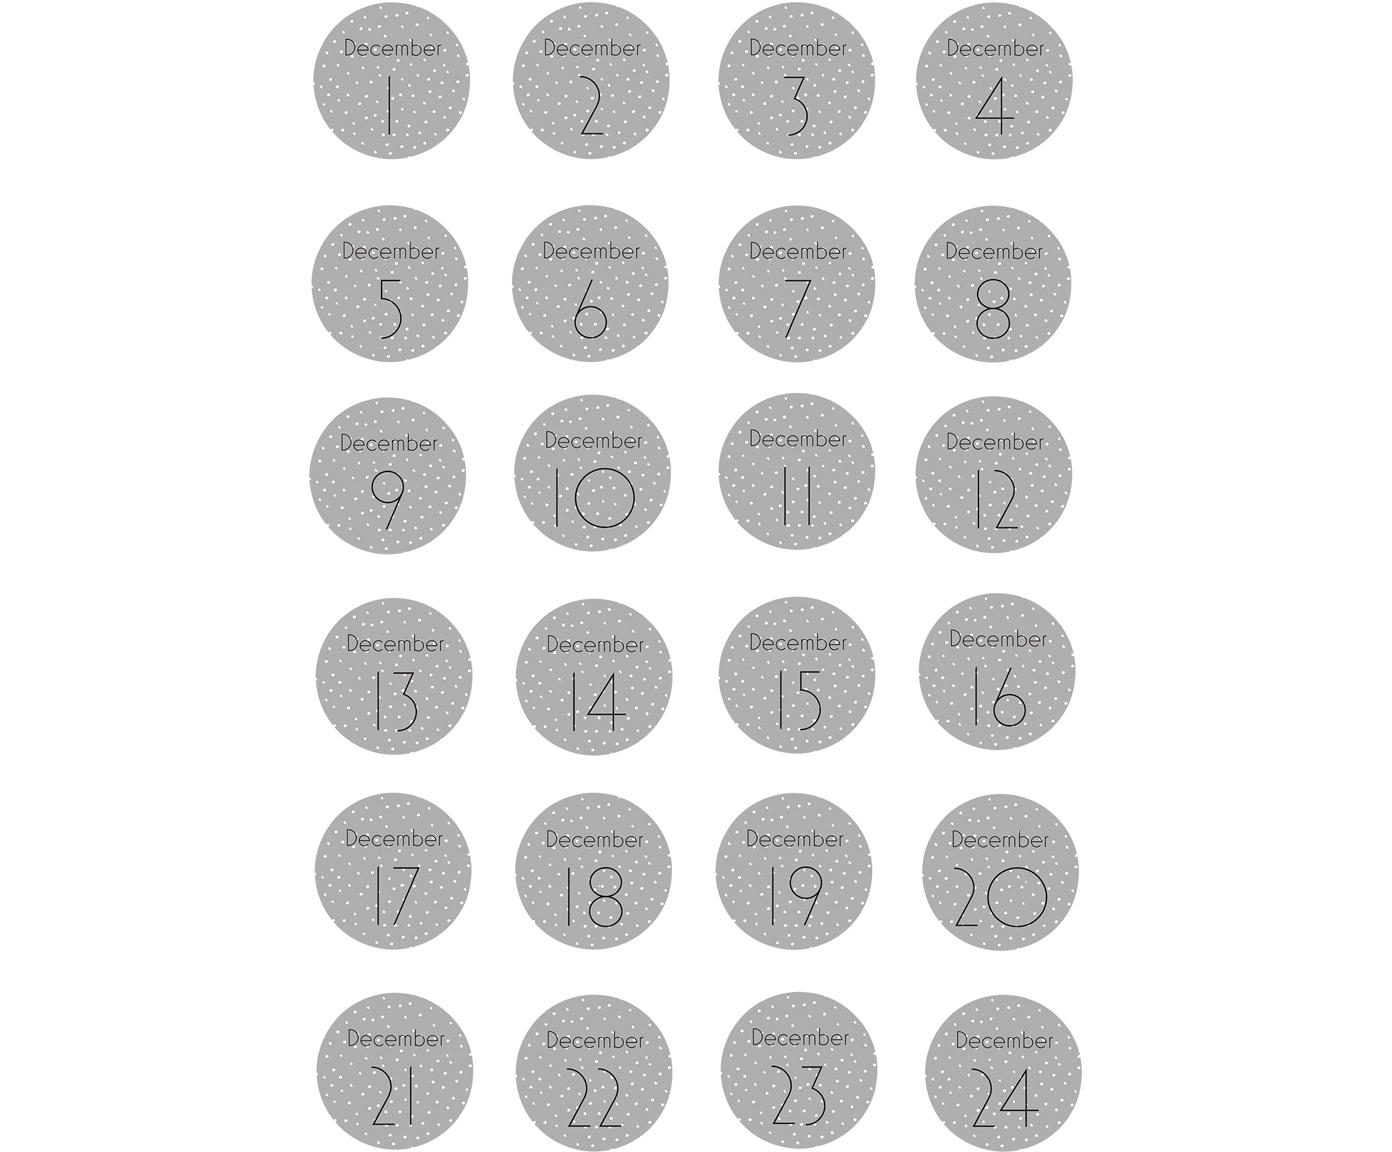 Set de adhesivos Advent, 24pzas., Papel, Gris, blanco, negro, Ø 5 cm